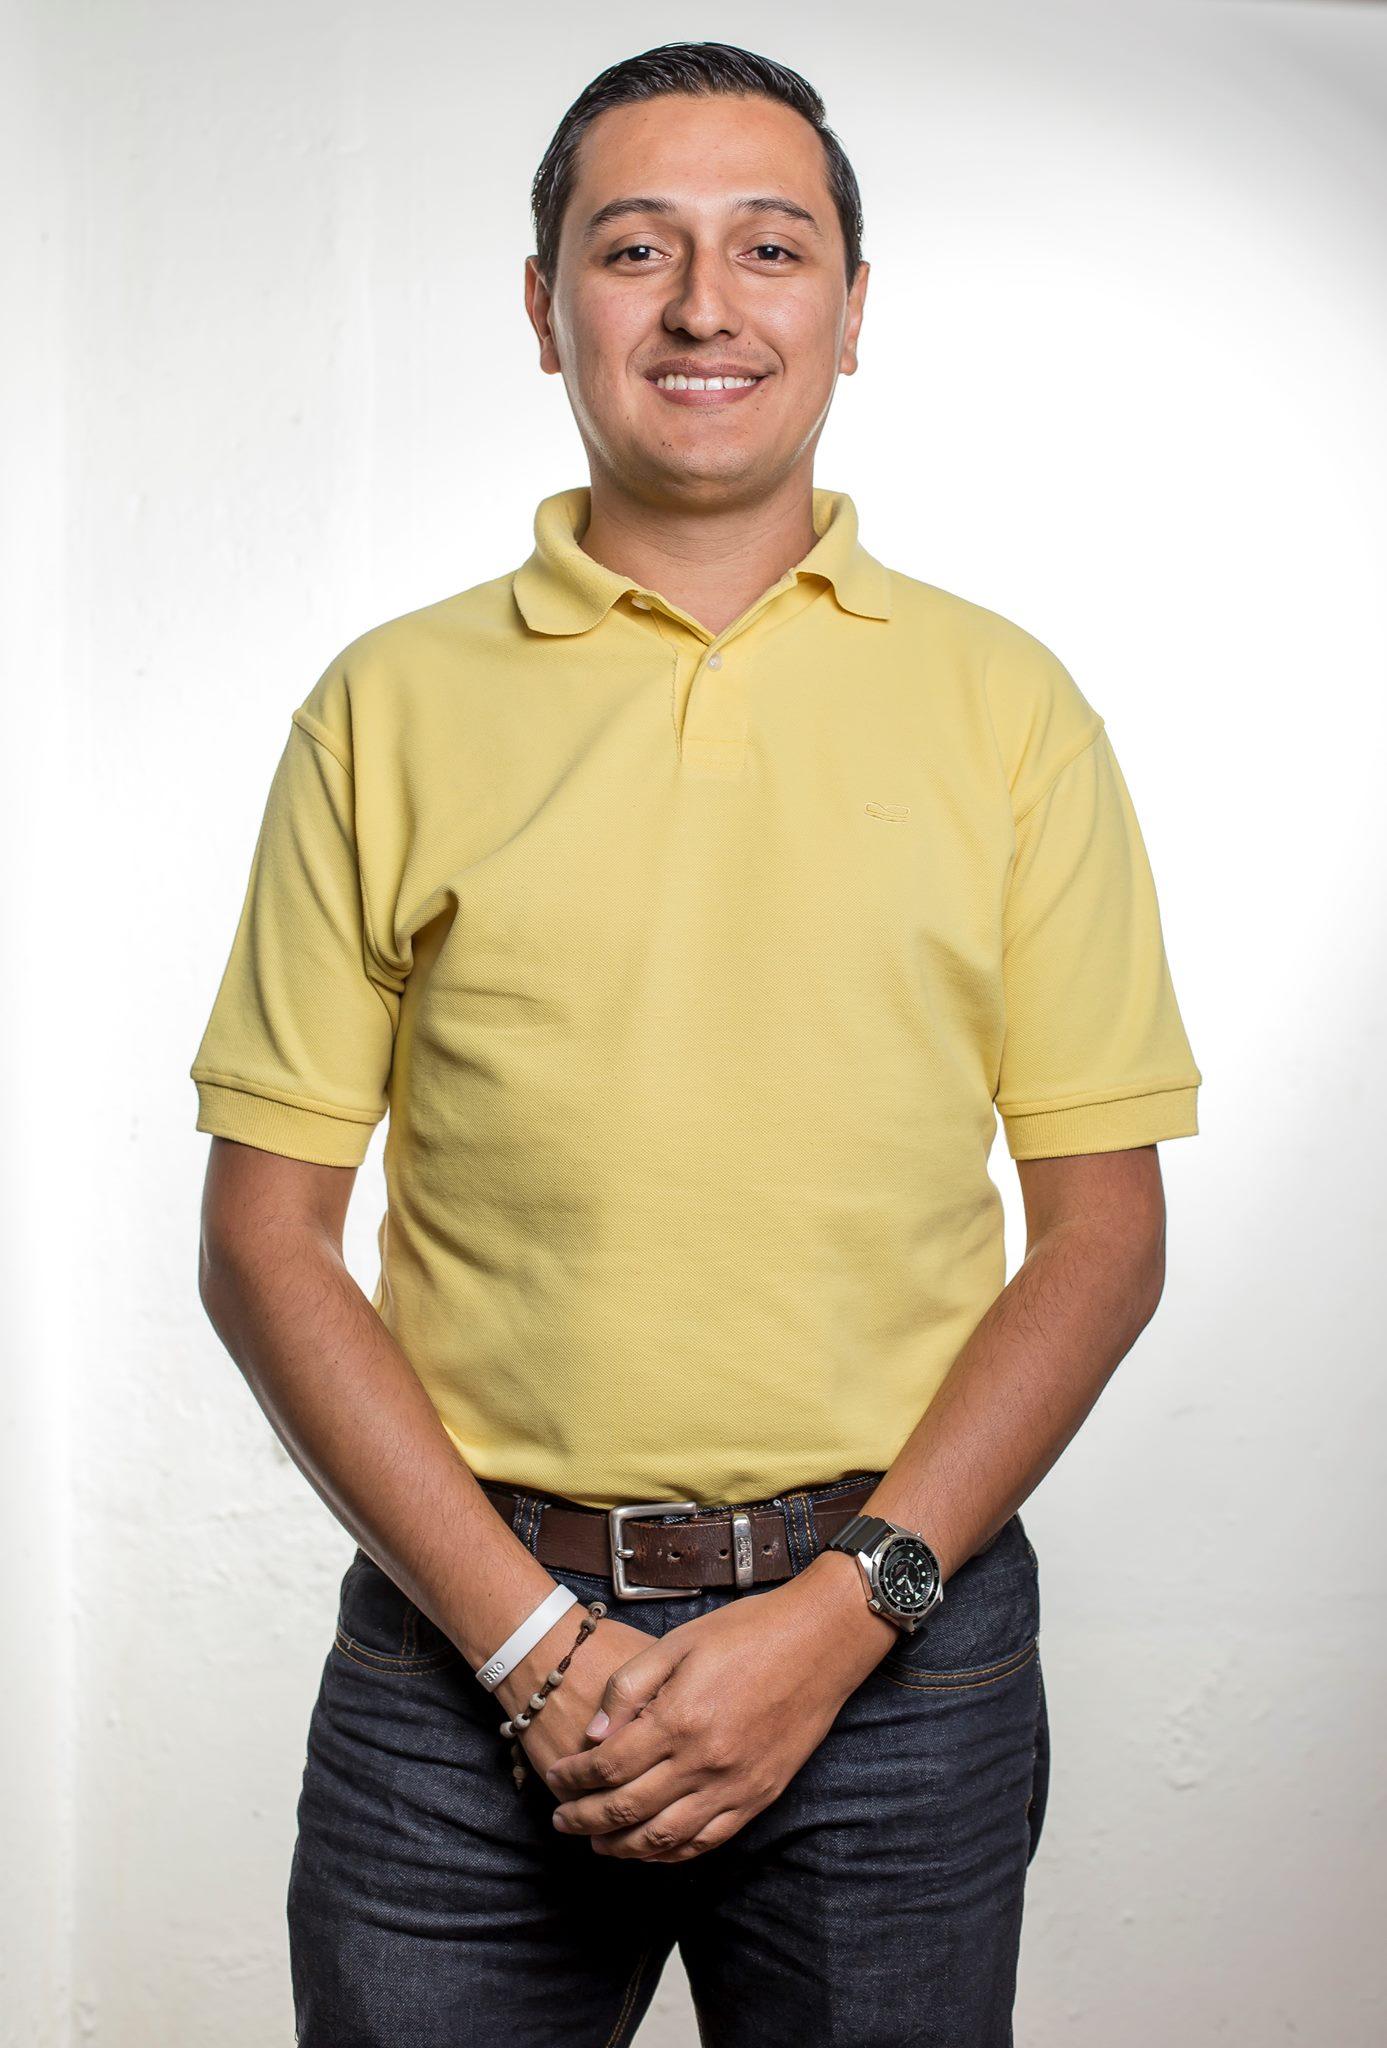 Marvin Gustavo